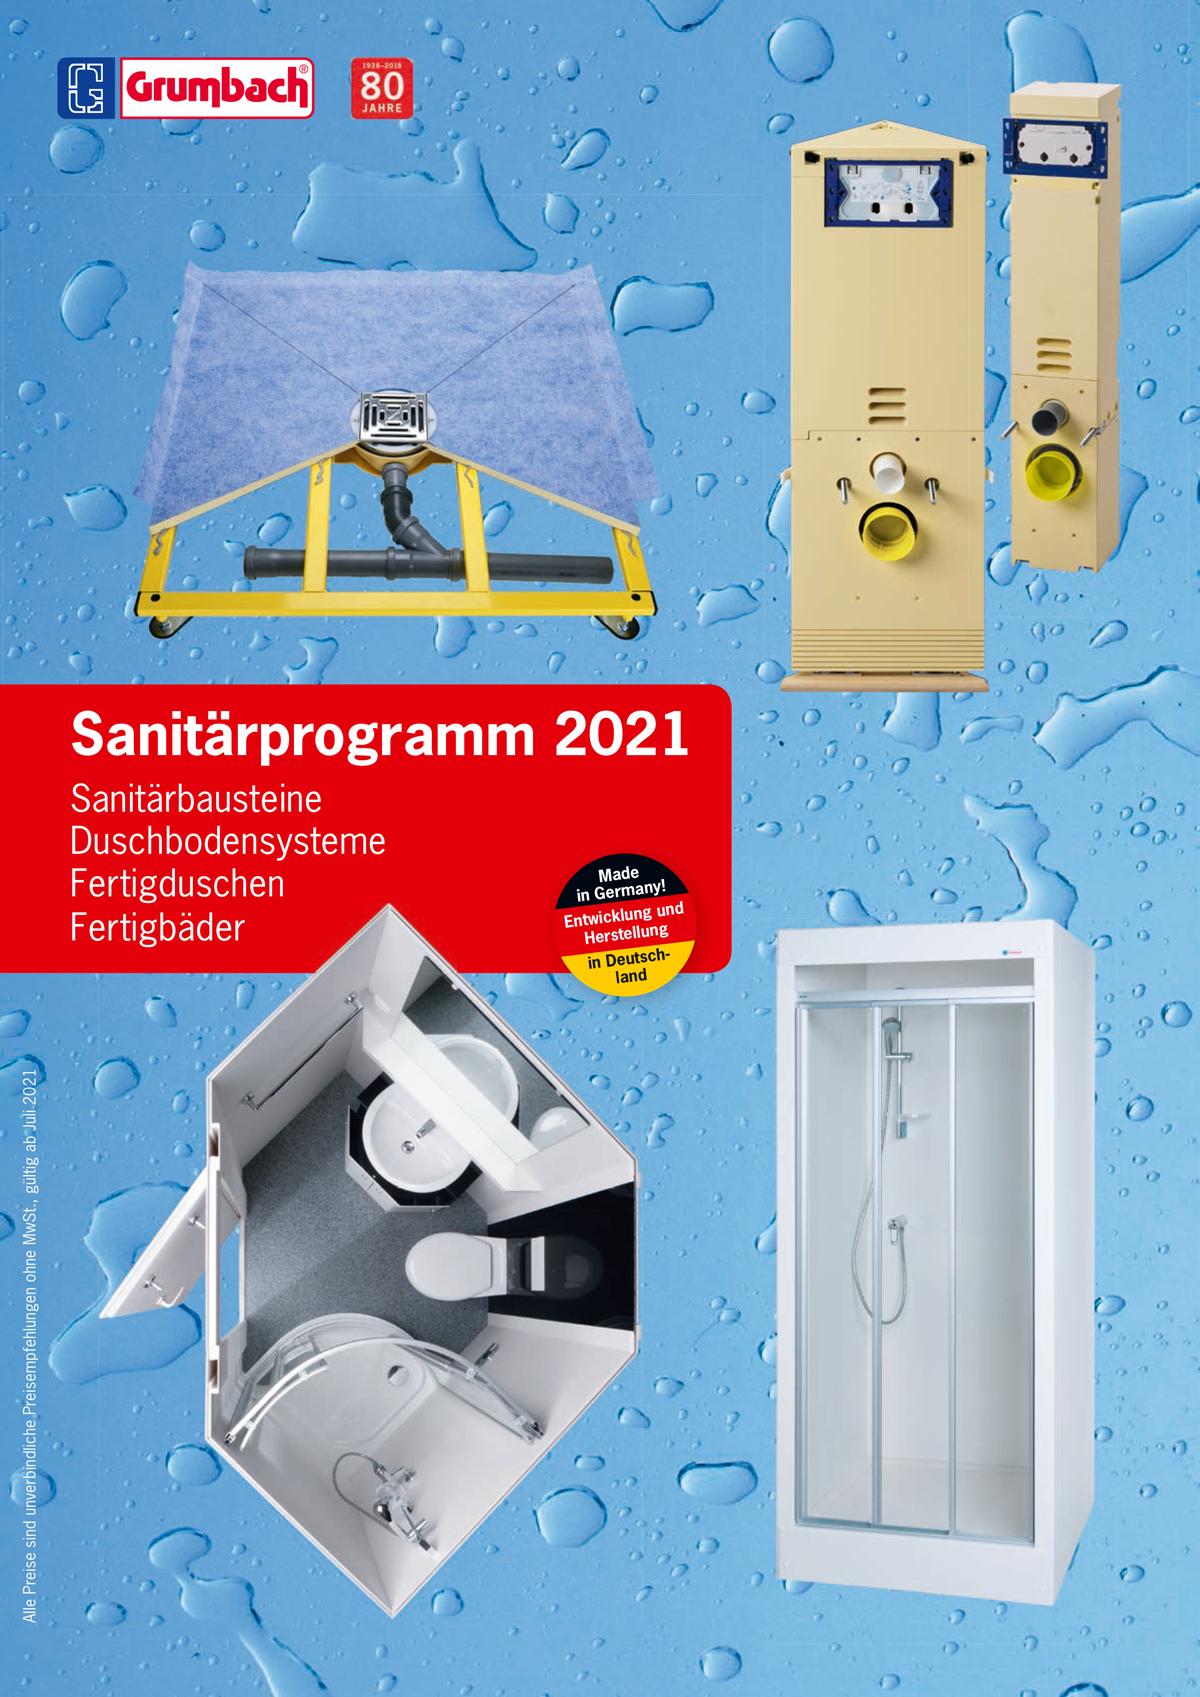 Grumbach Flachdachprogramm 2020